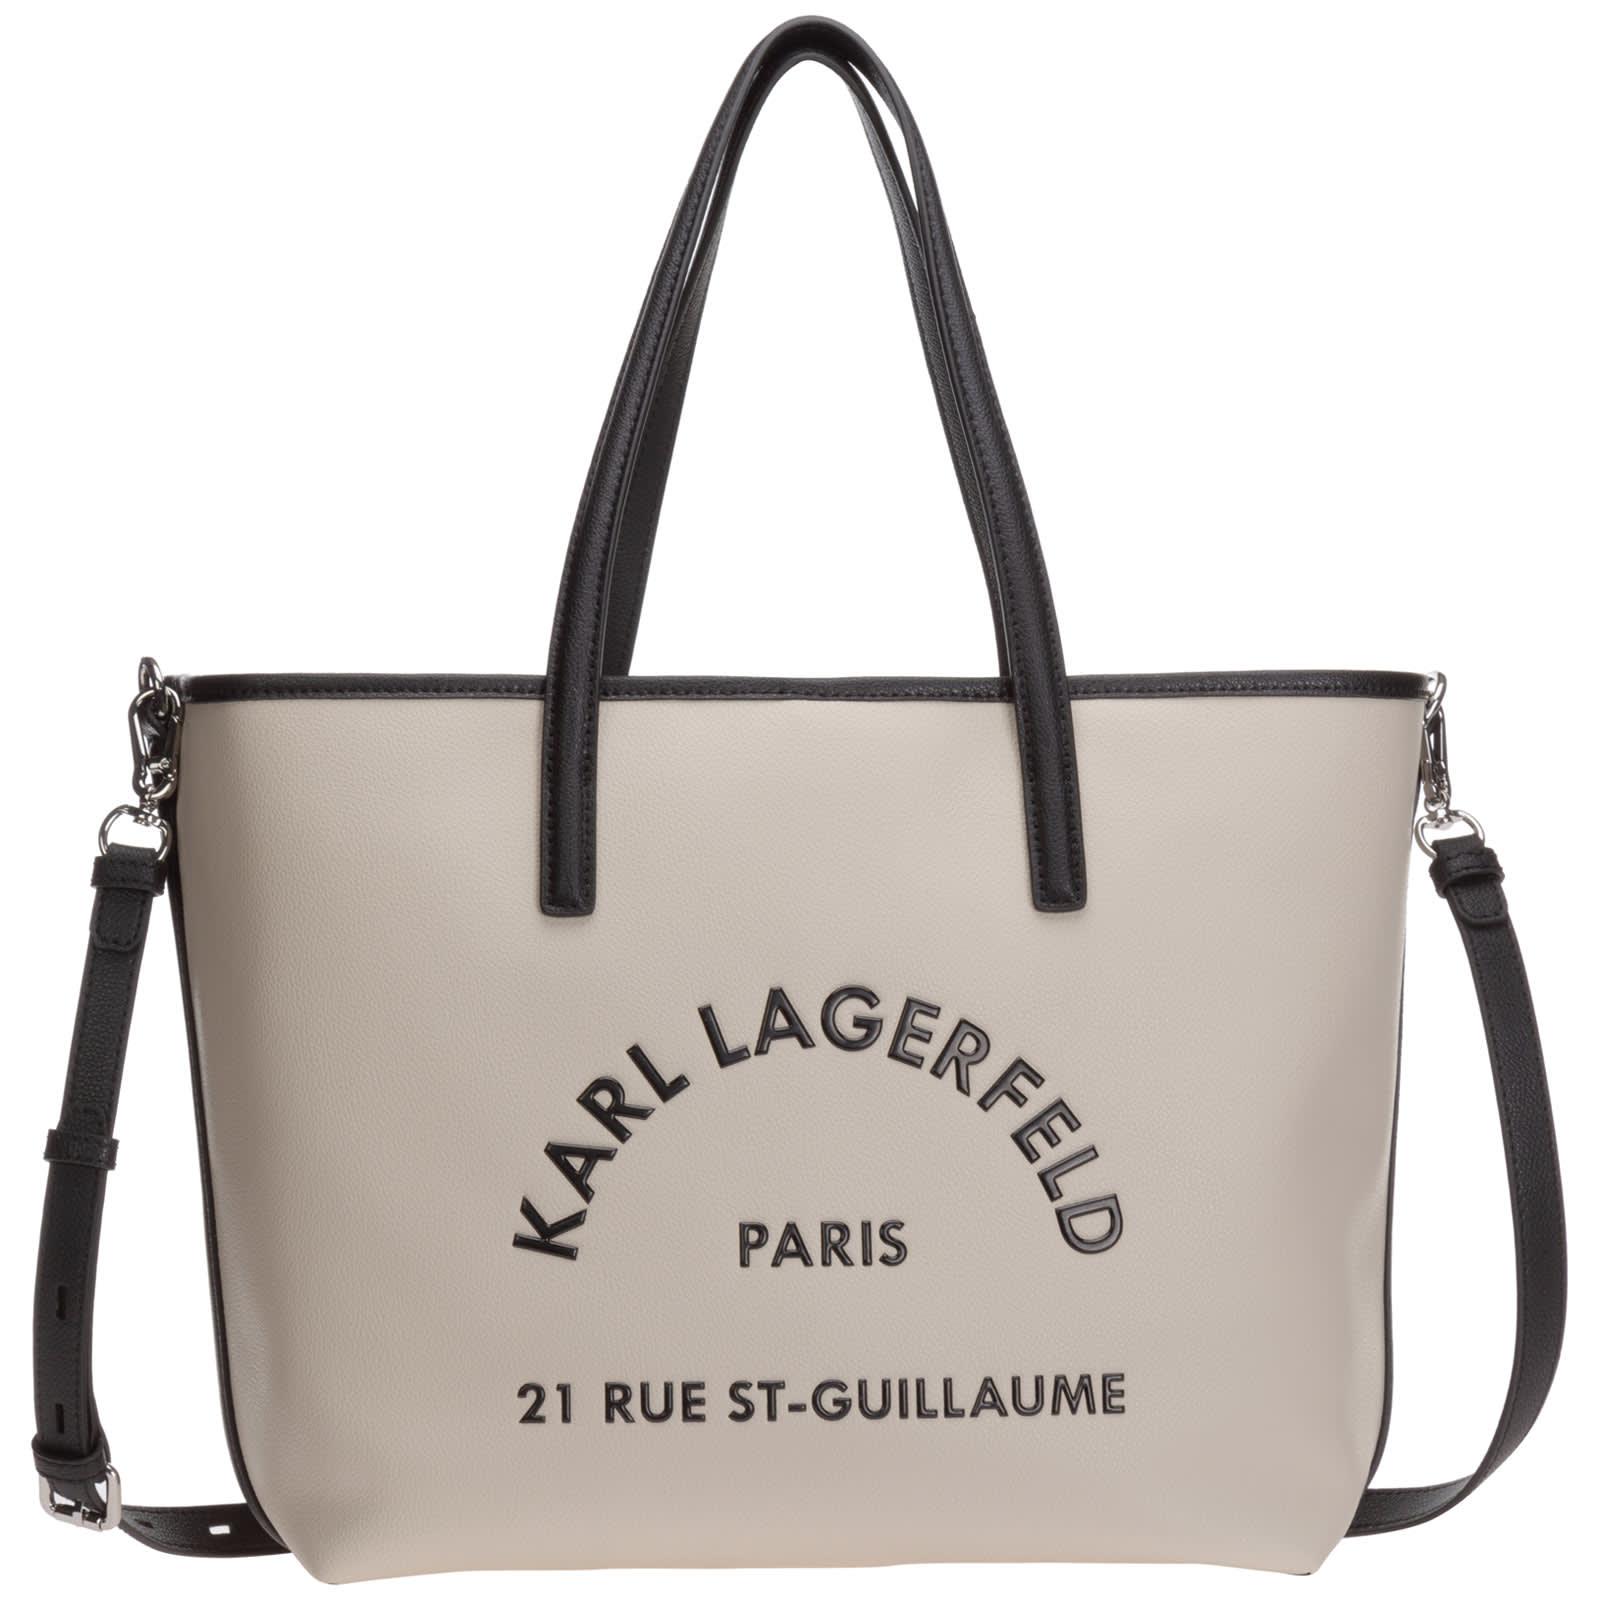 Karl Lagerfeld Rue St Guillaume Tote Bag